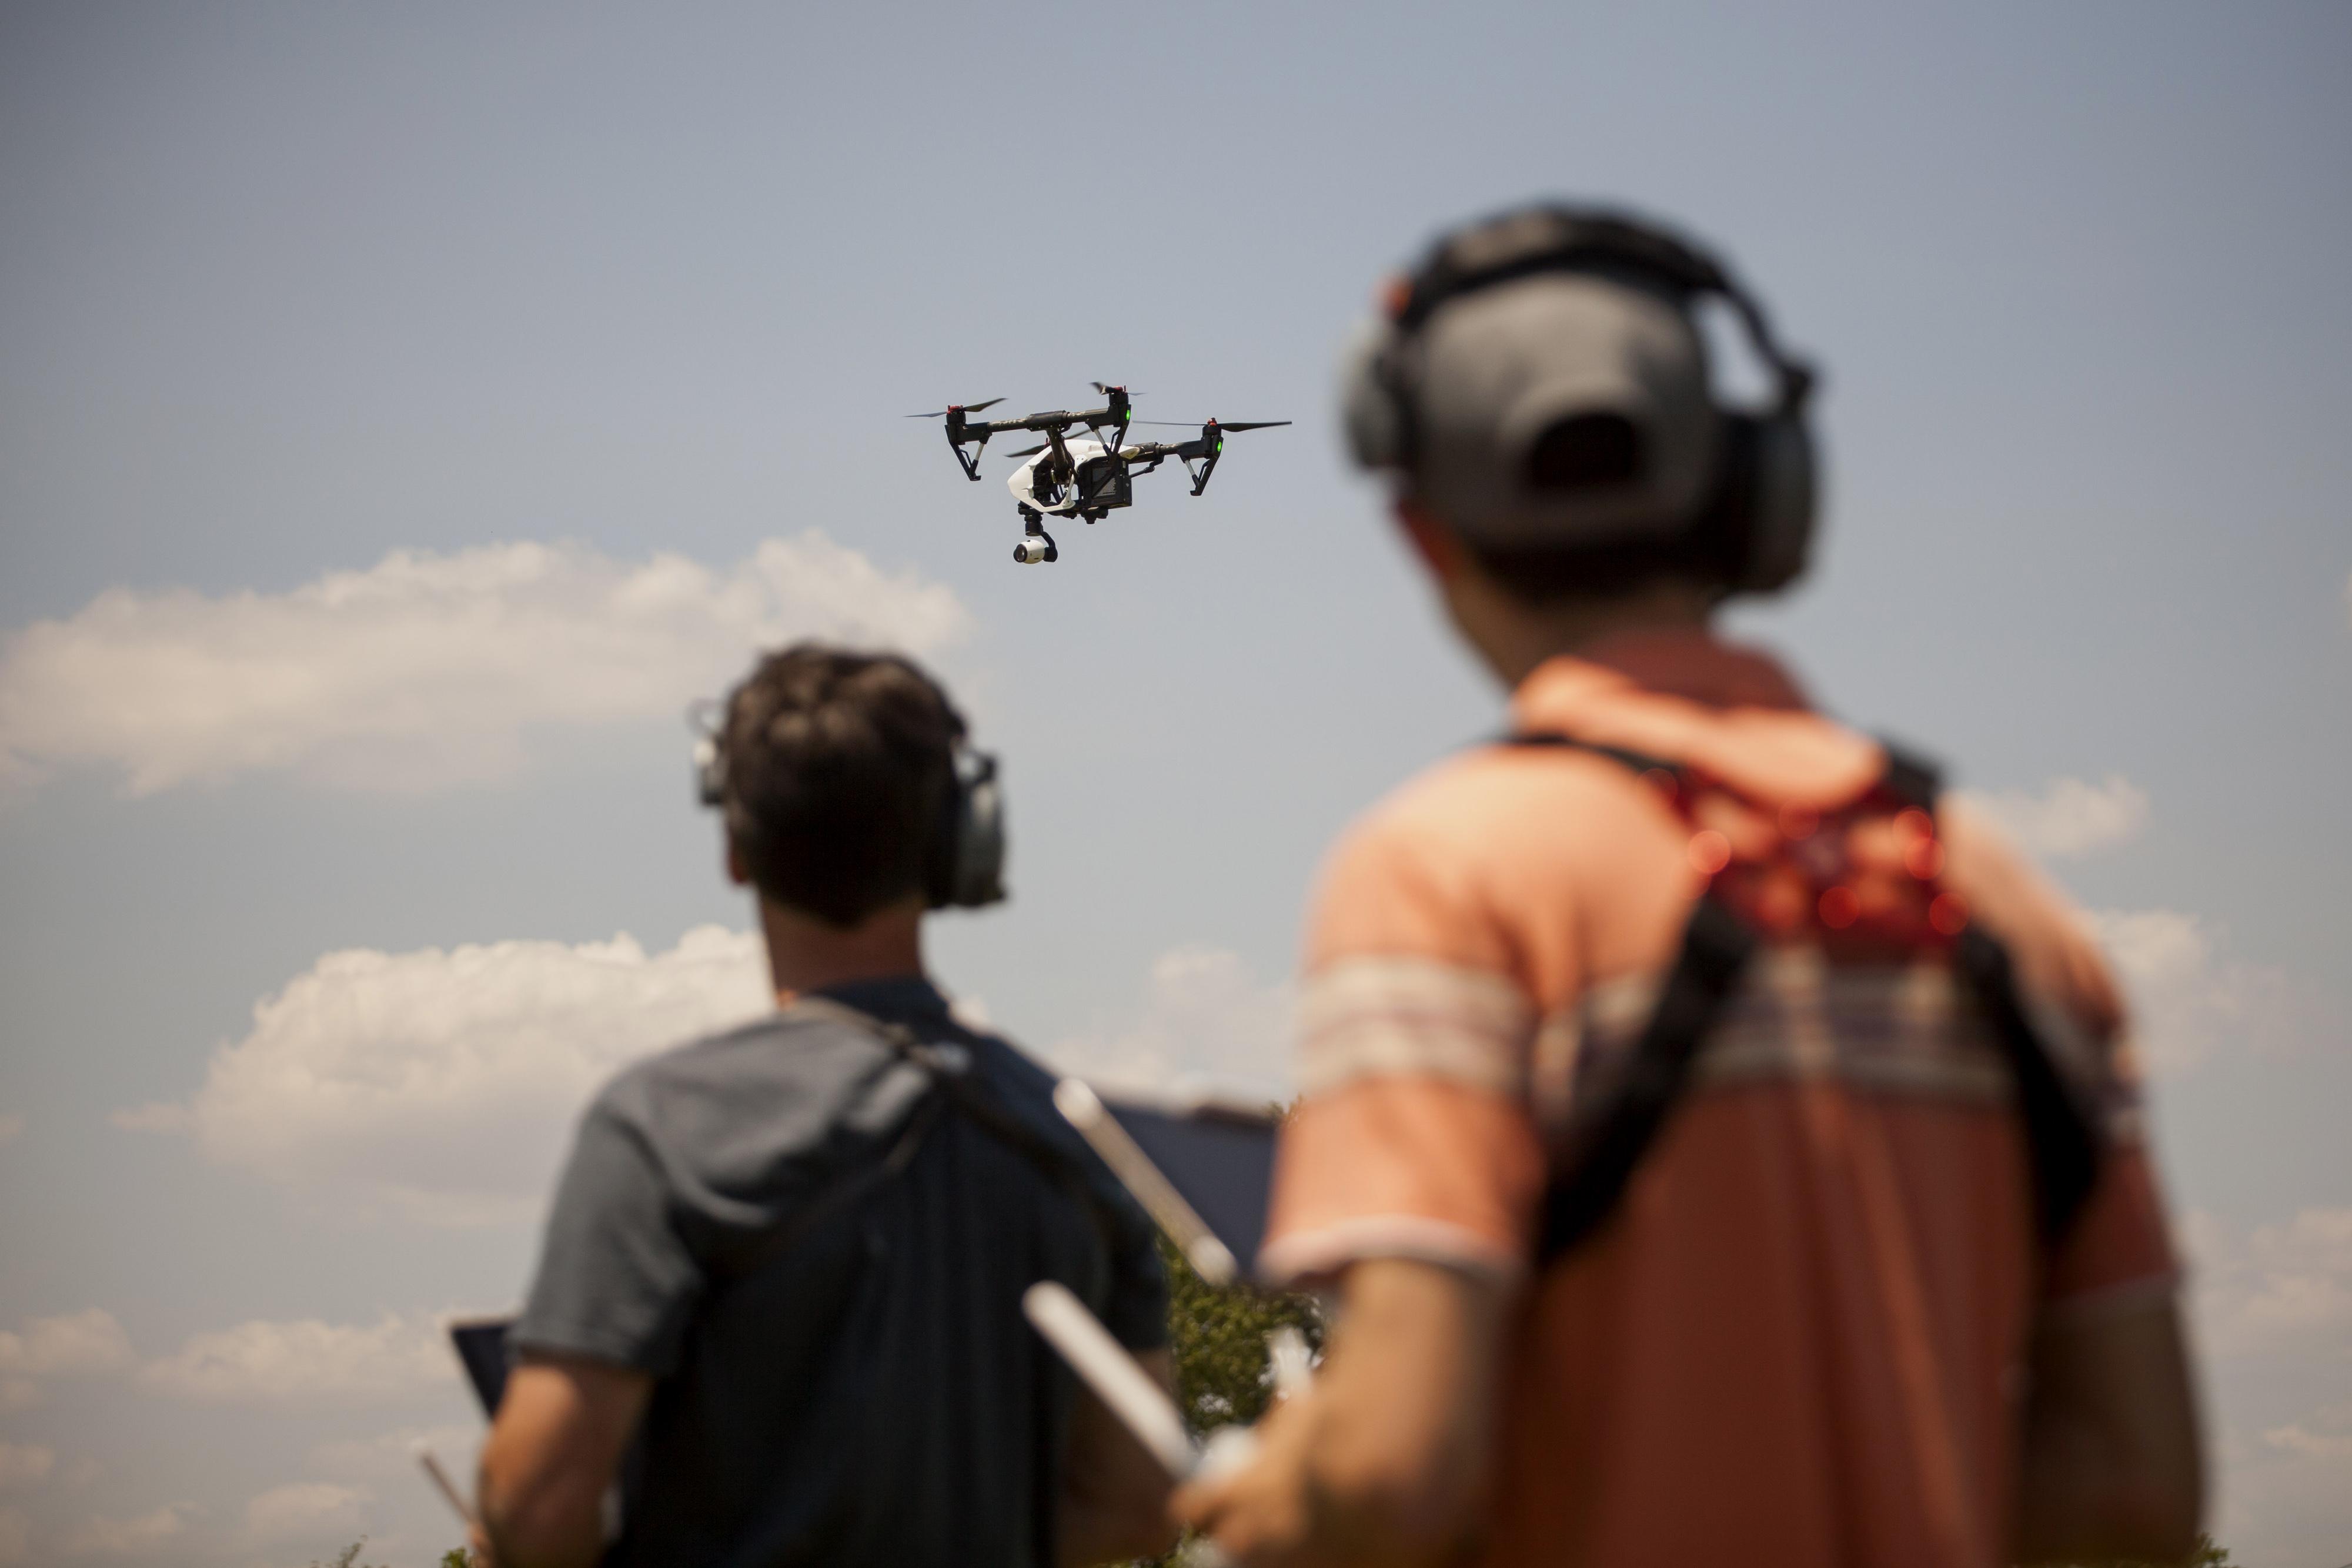 bloomberg.com - Alan Levin - Groundbreaking U.S. Plan Would Permit Drone Flights Over Crowds